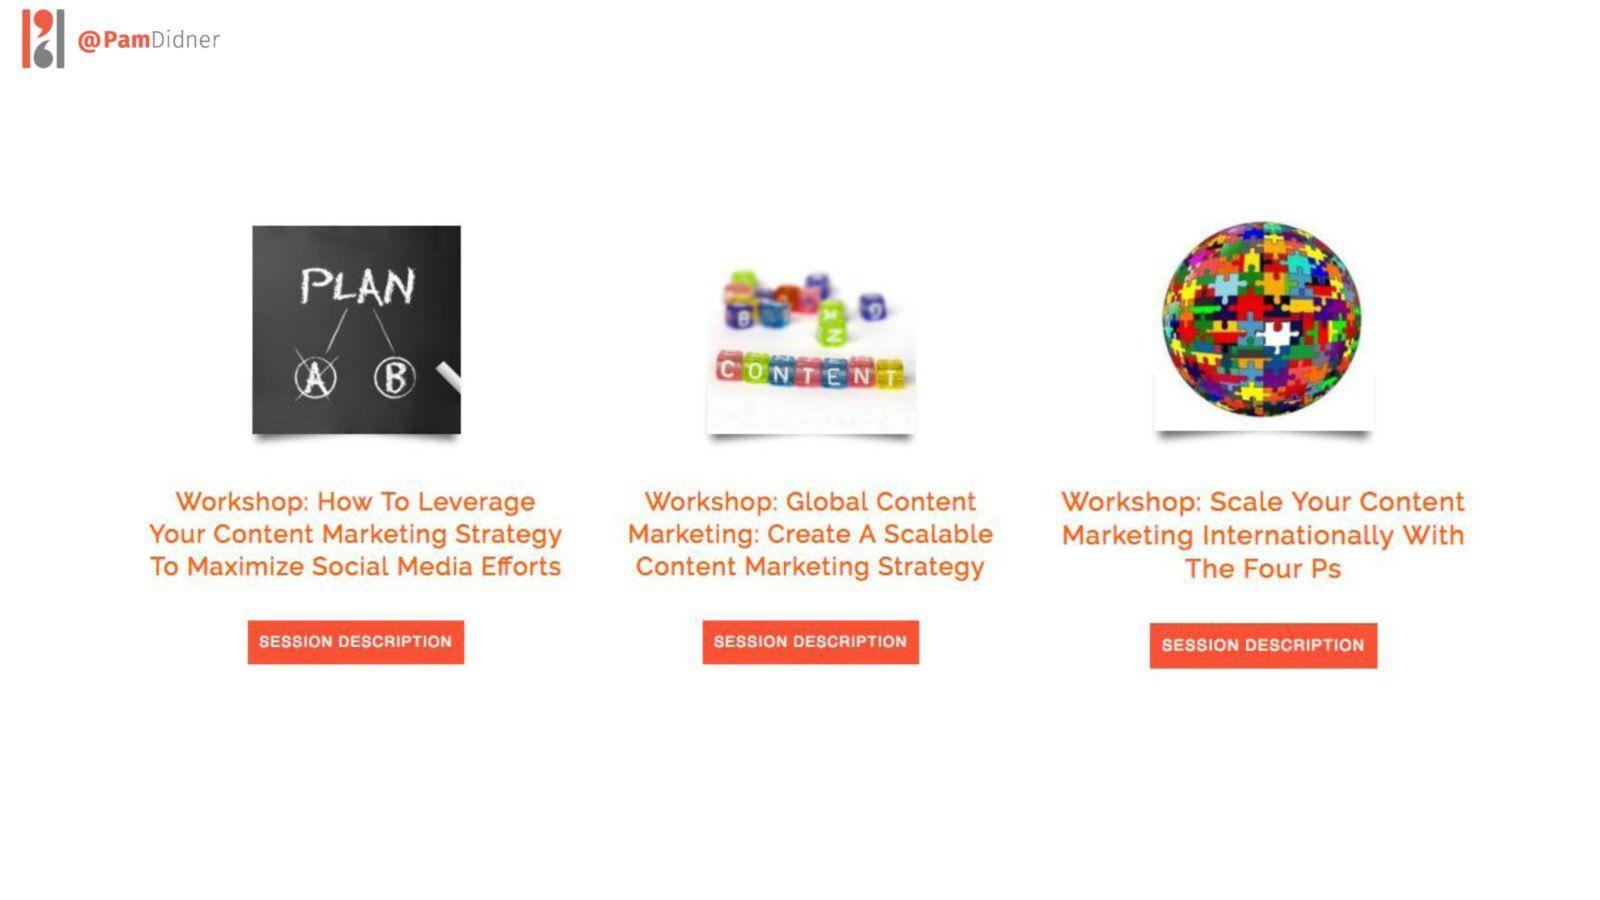 Content Marketing Workshops Pam Didner